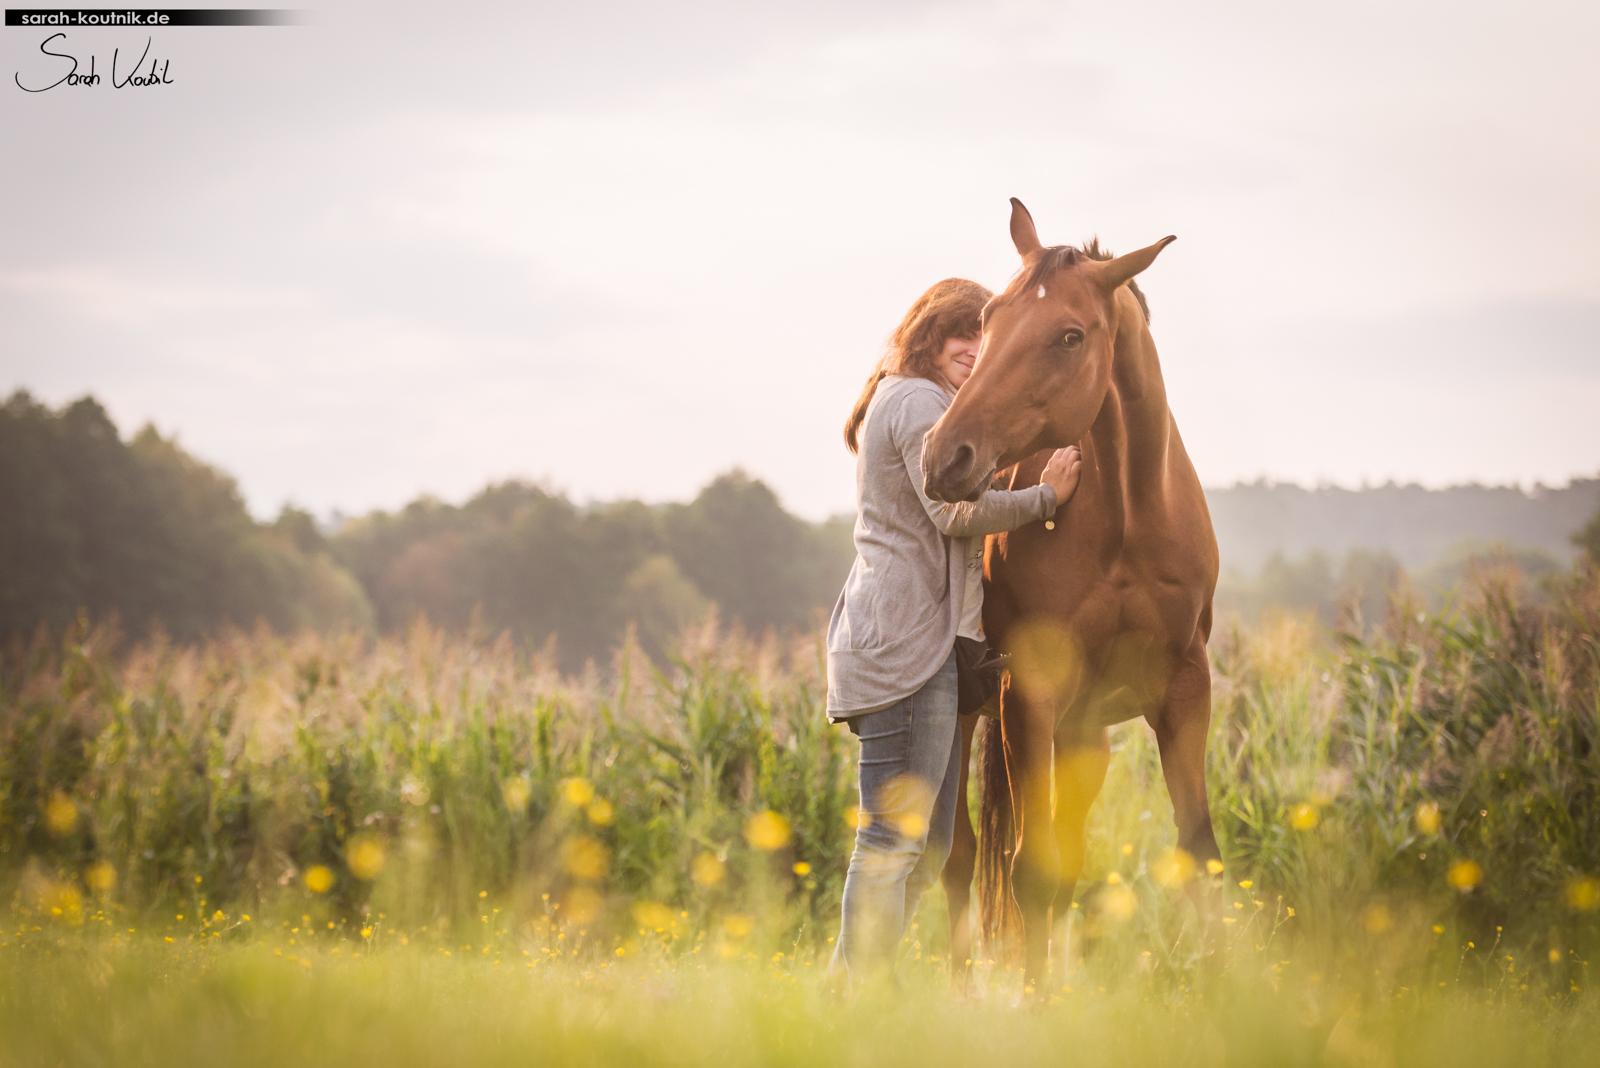 Emotionen einfangen | Warmblutstute Chance | Pferdefotografie | Berlin | München | Sarah Koutnik Fotografie